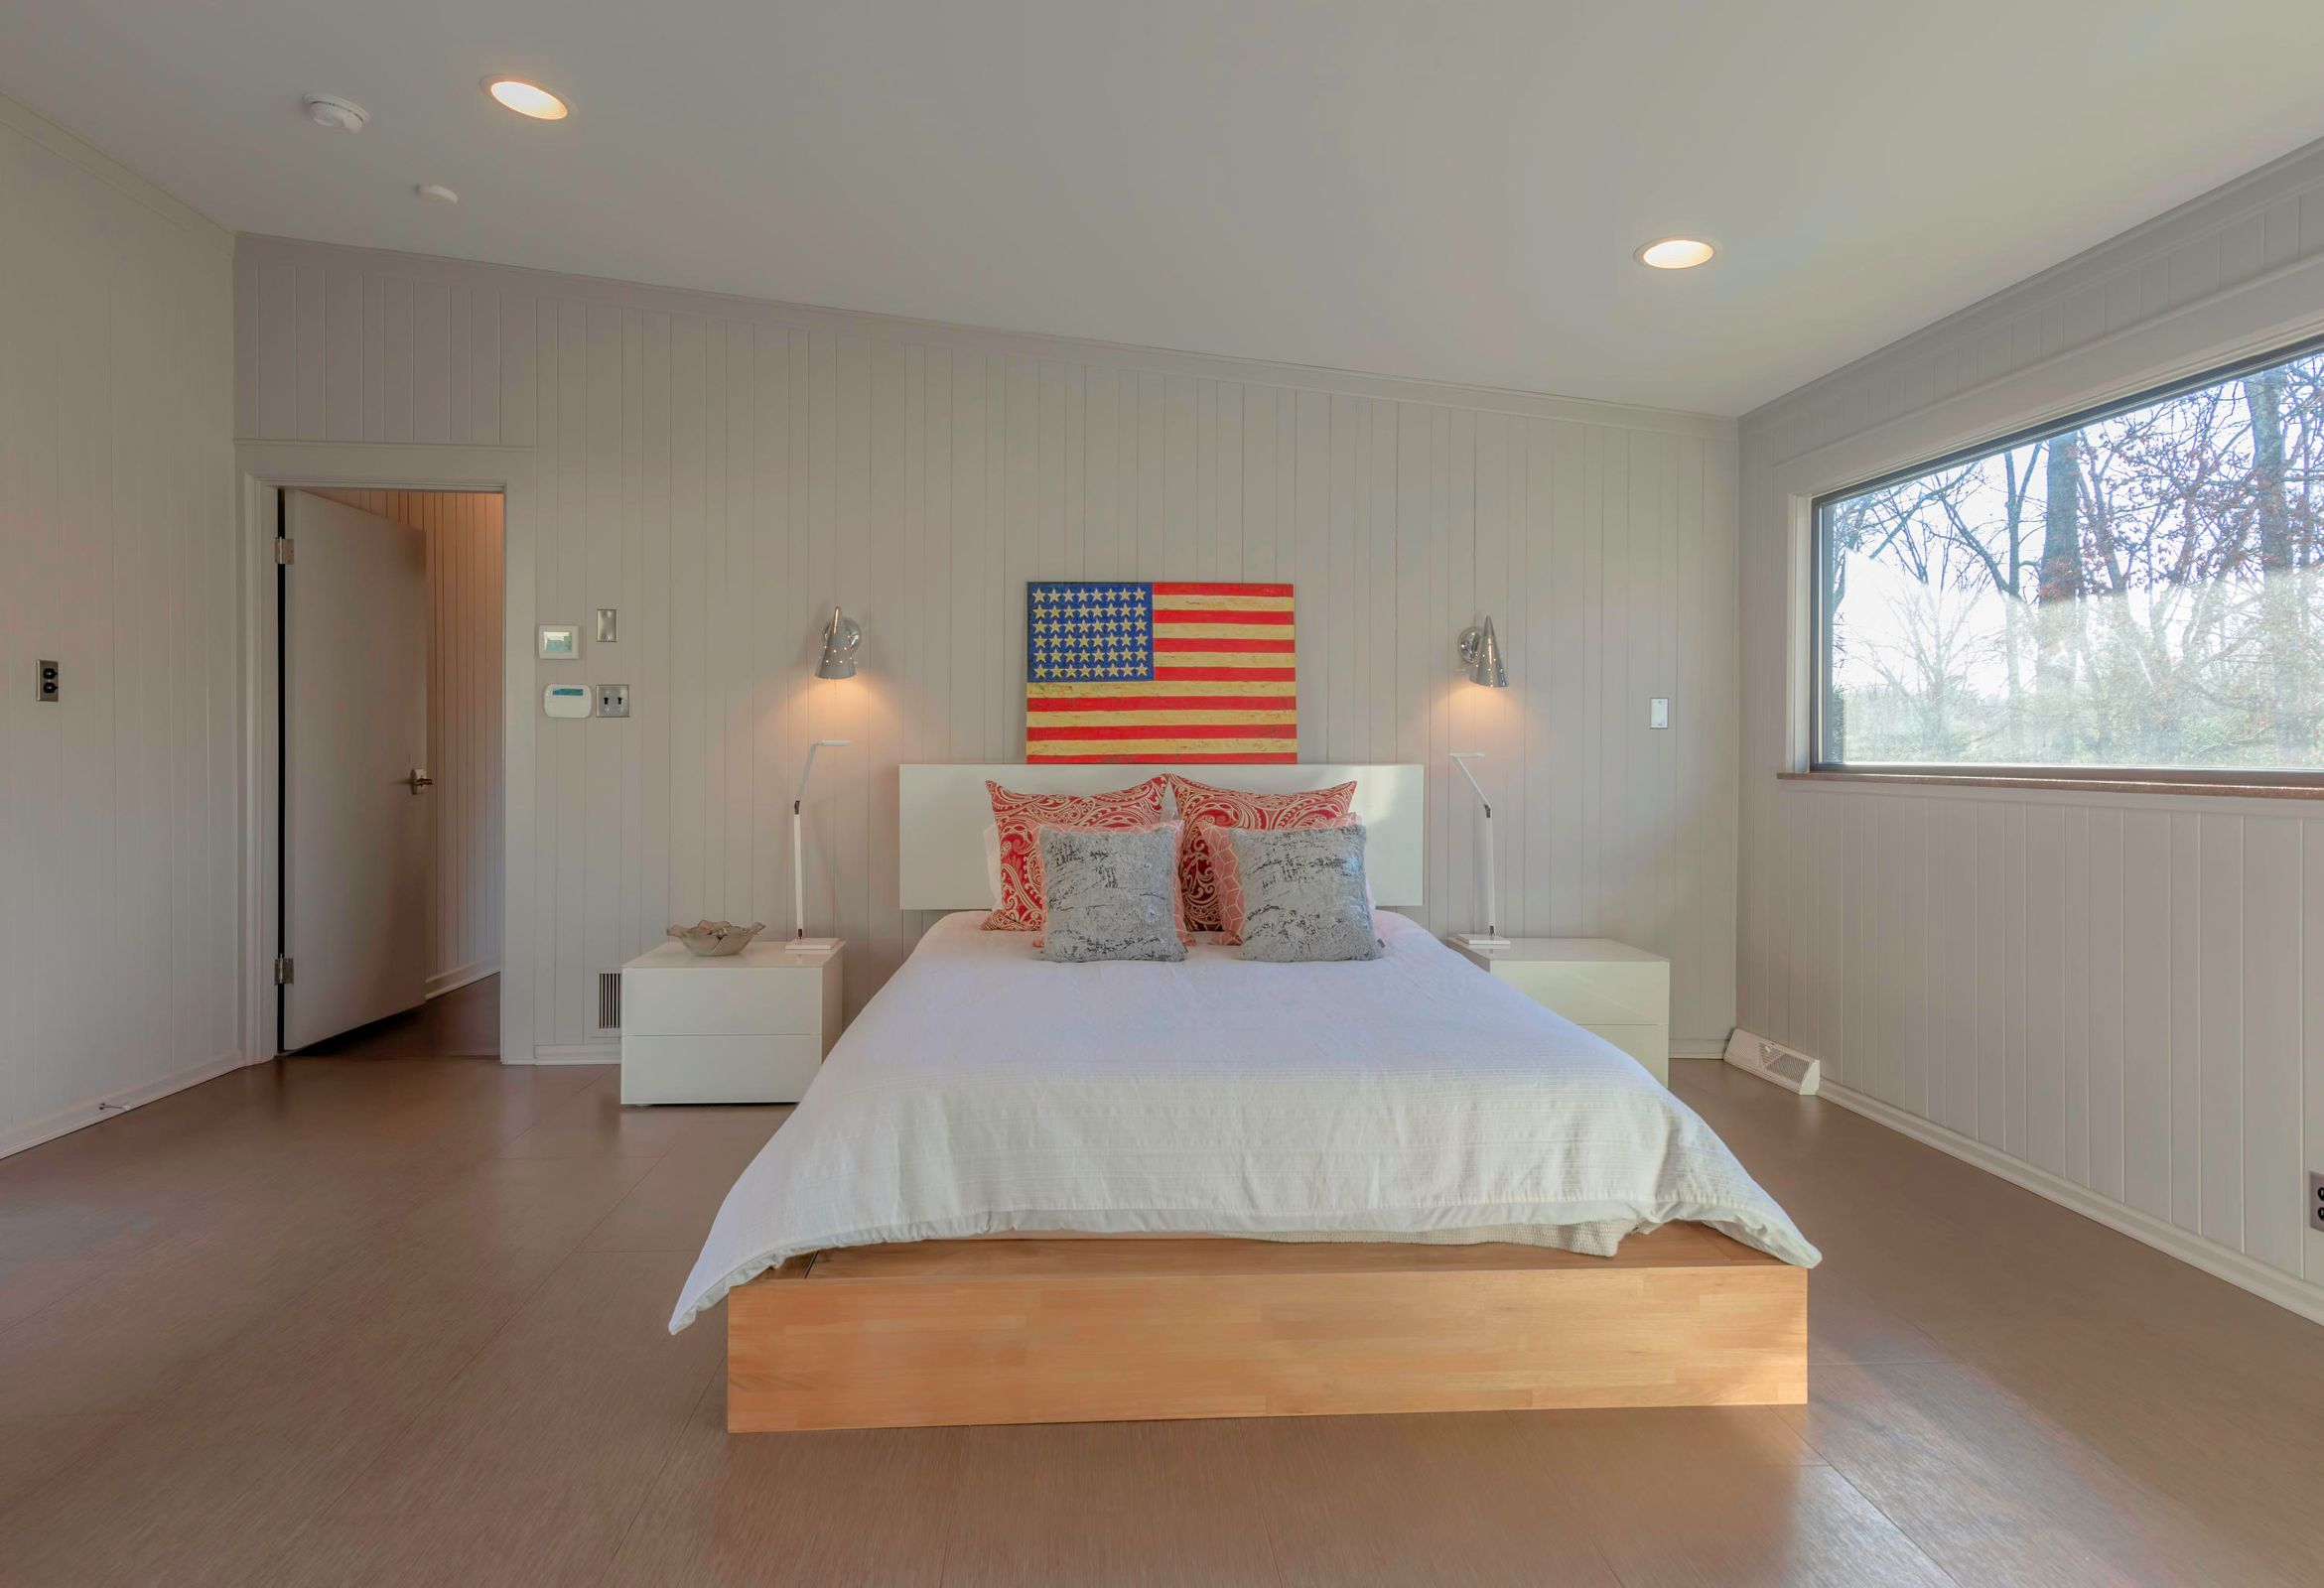 DSC_2031 - Master Bedroom